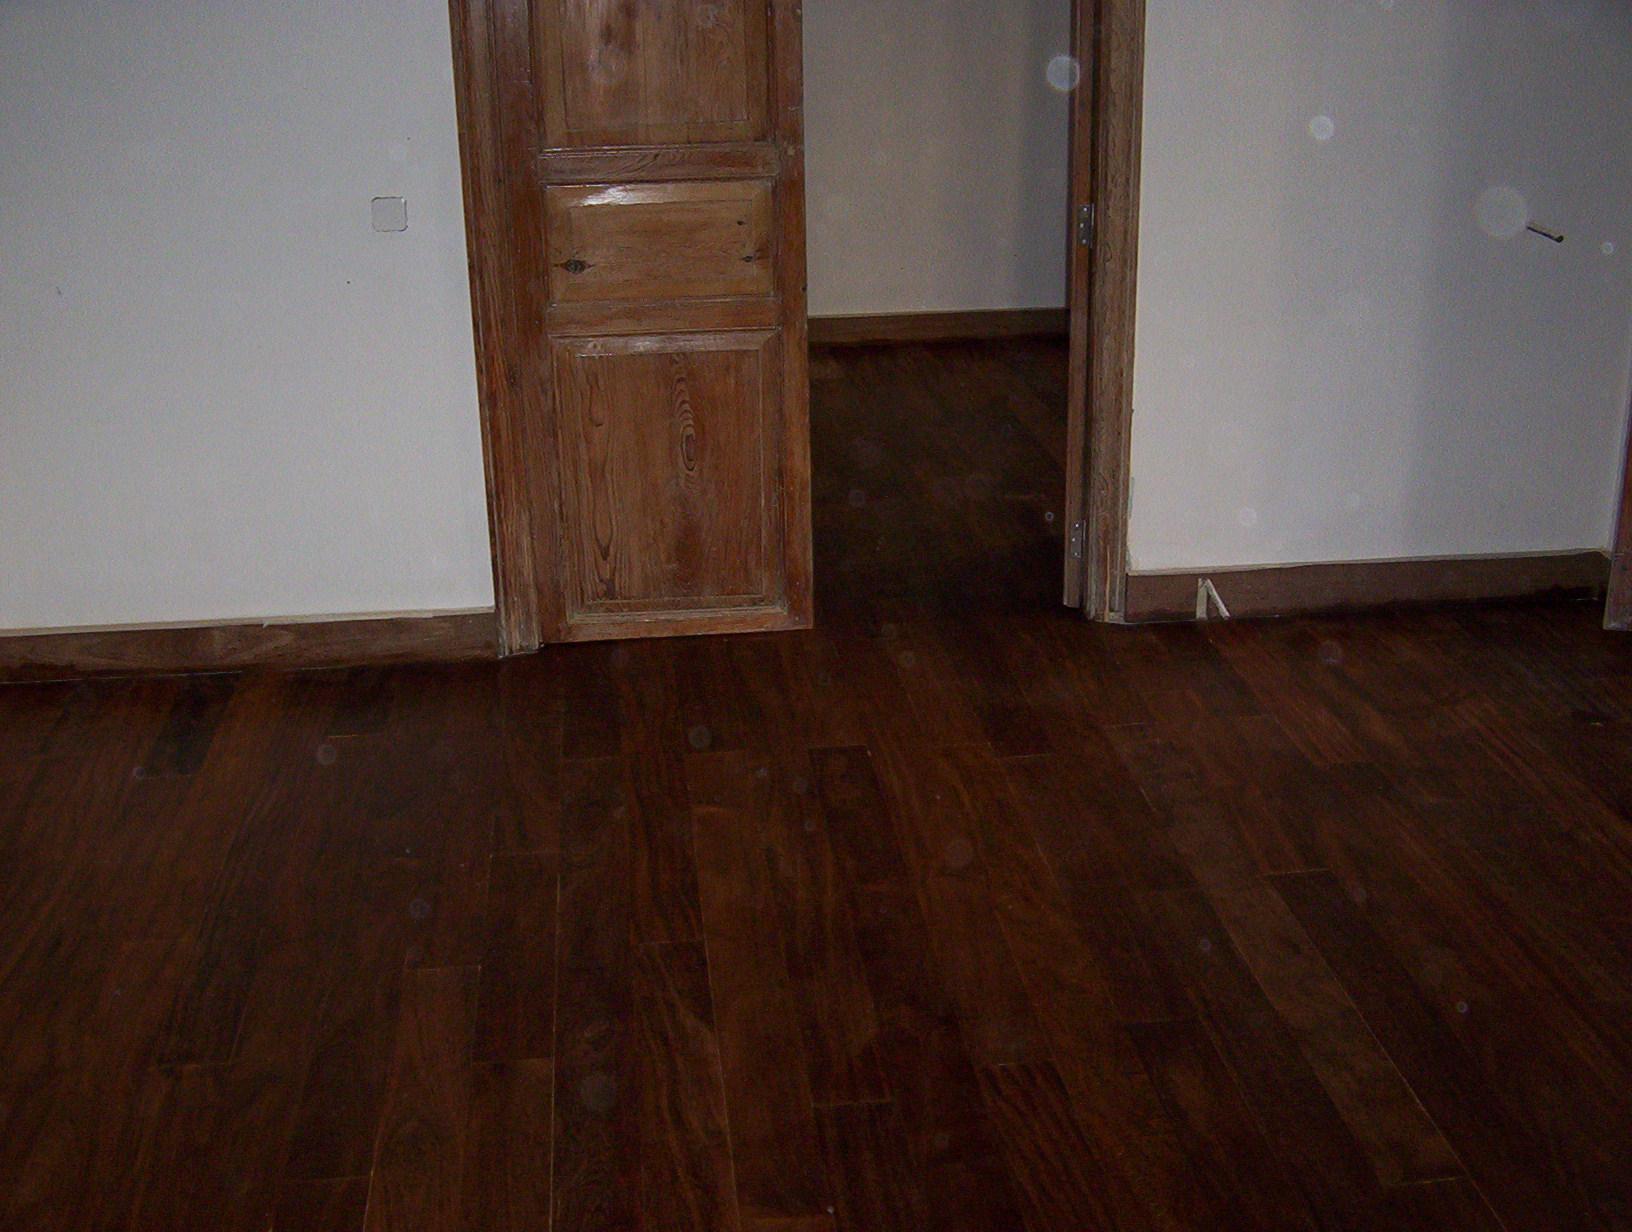 Instalaci n de tarima de interior maciza haya jatoba - Tarima madera interior ...